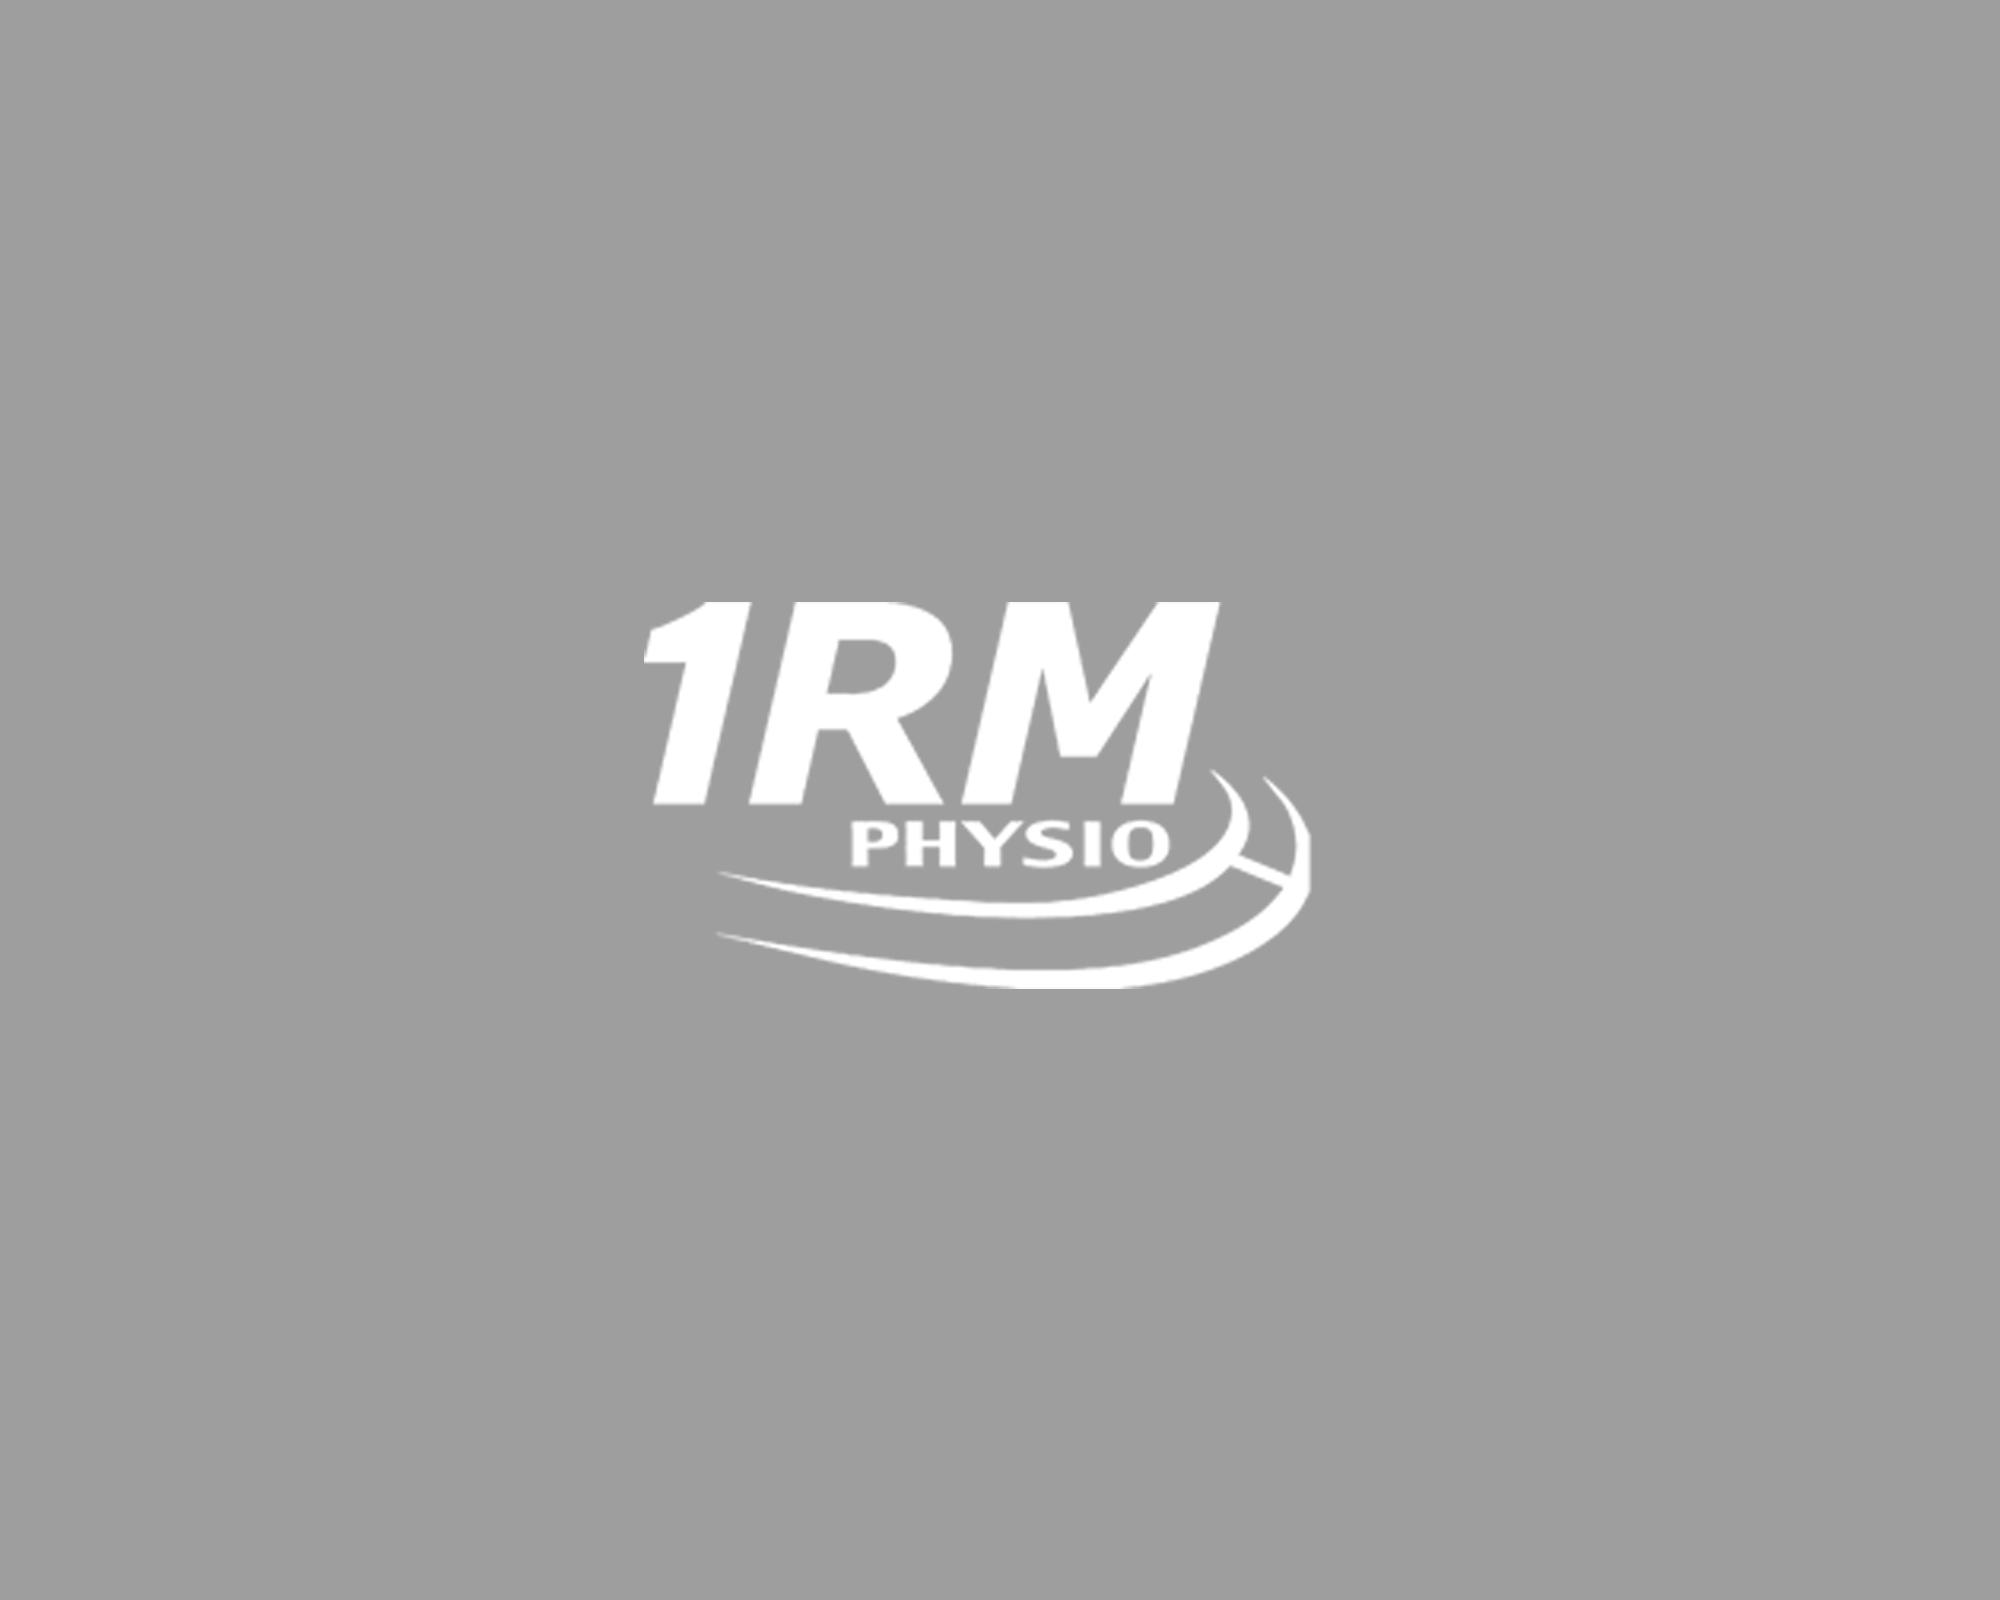 1rm physio Logo